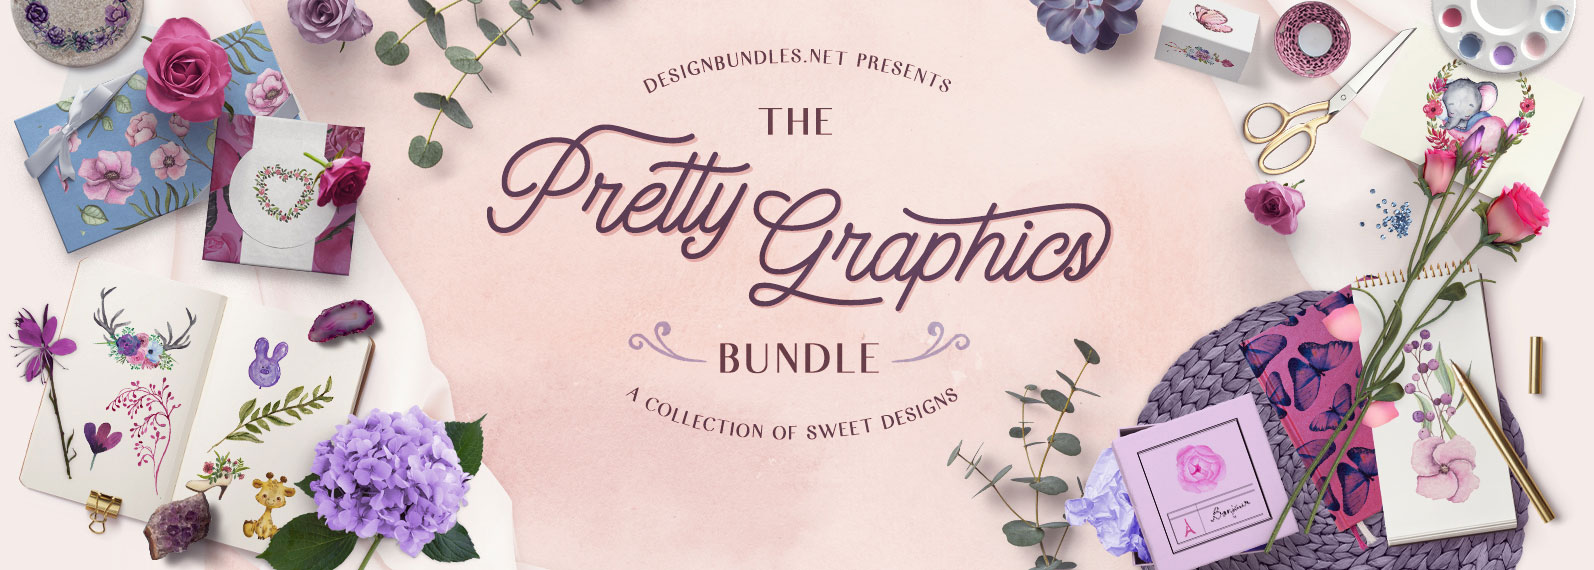 The-Pretty-Graphics-Bundle-cover.jpg